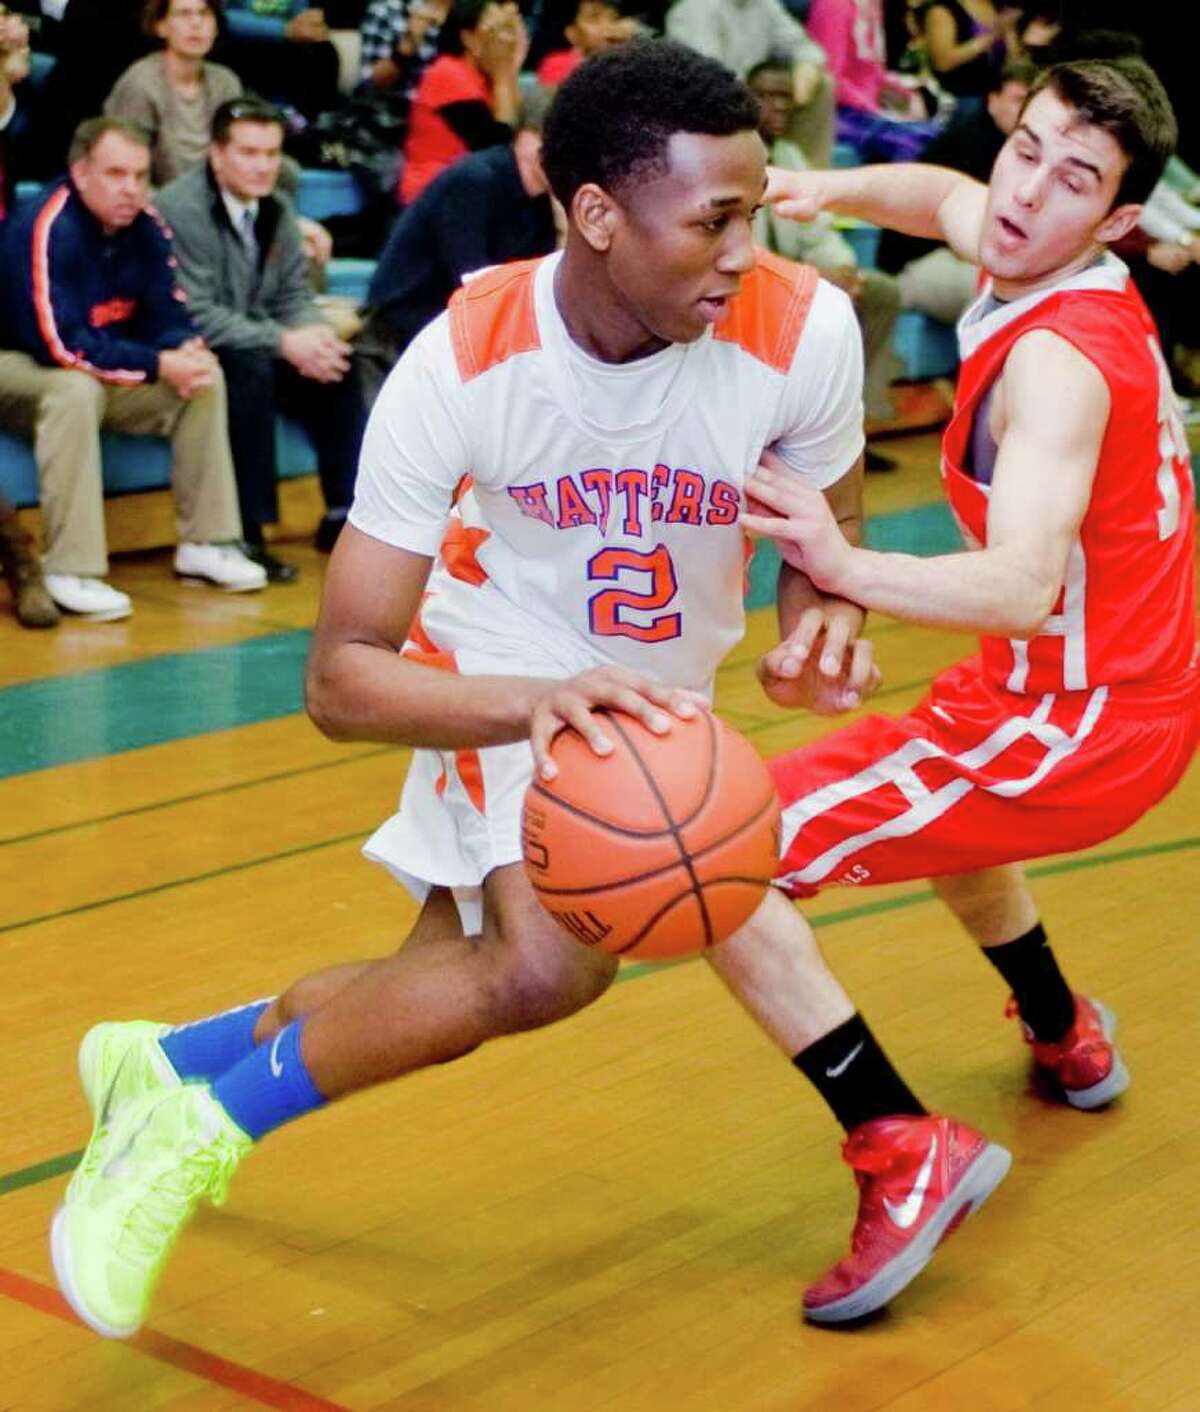 Danbury High School's Danjoel Harris works the ball around Greenwich High School's Alejandro Rodriguez during a game at Danbury. Wednesday, Feb. 22, 2012